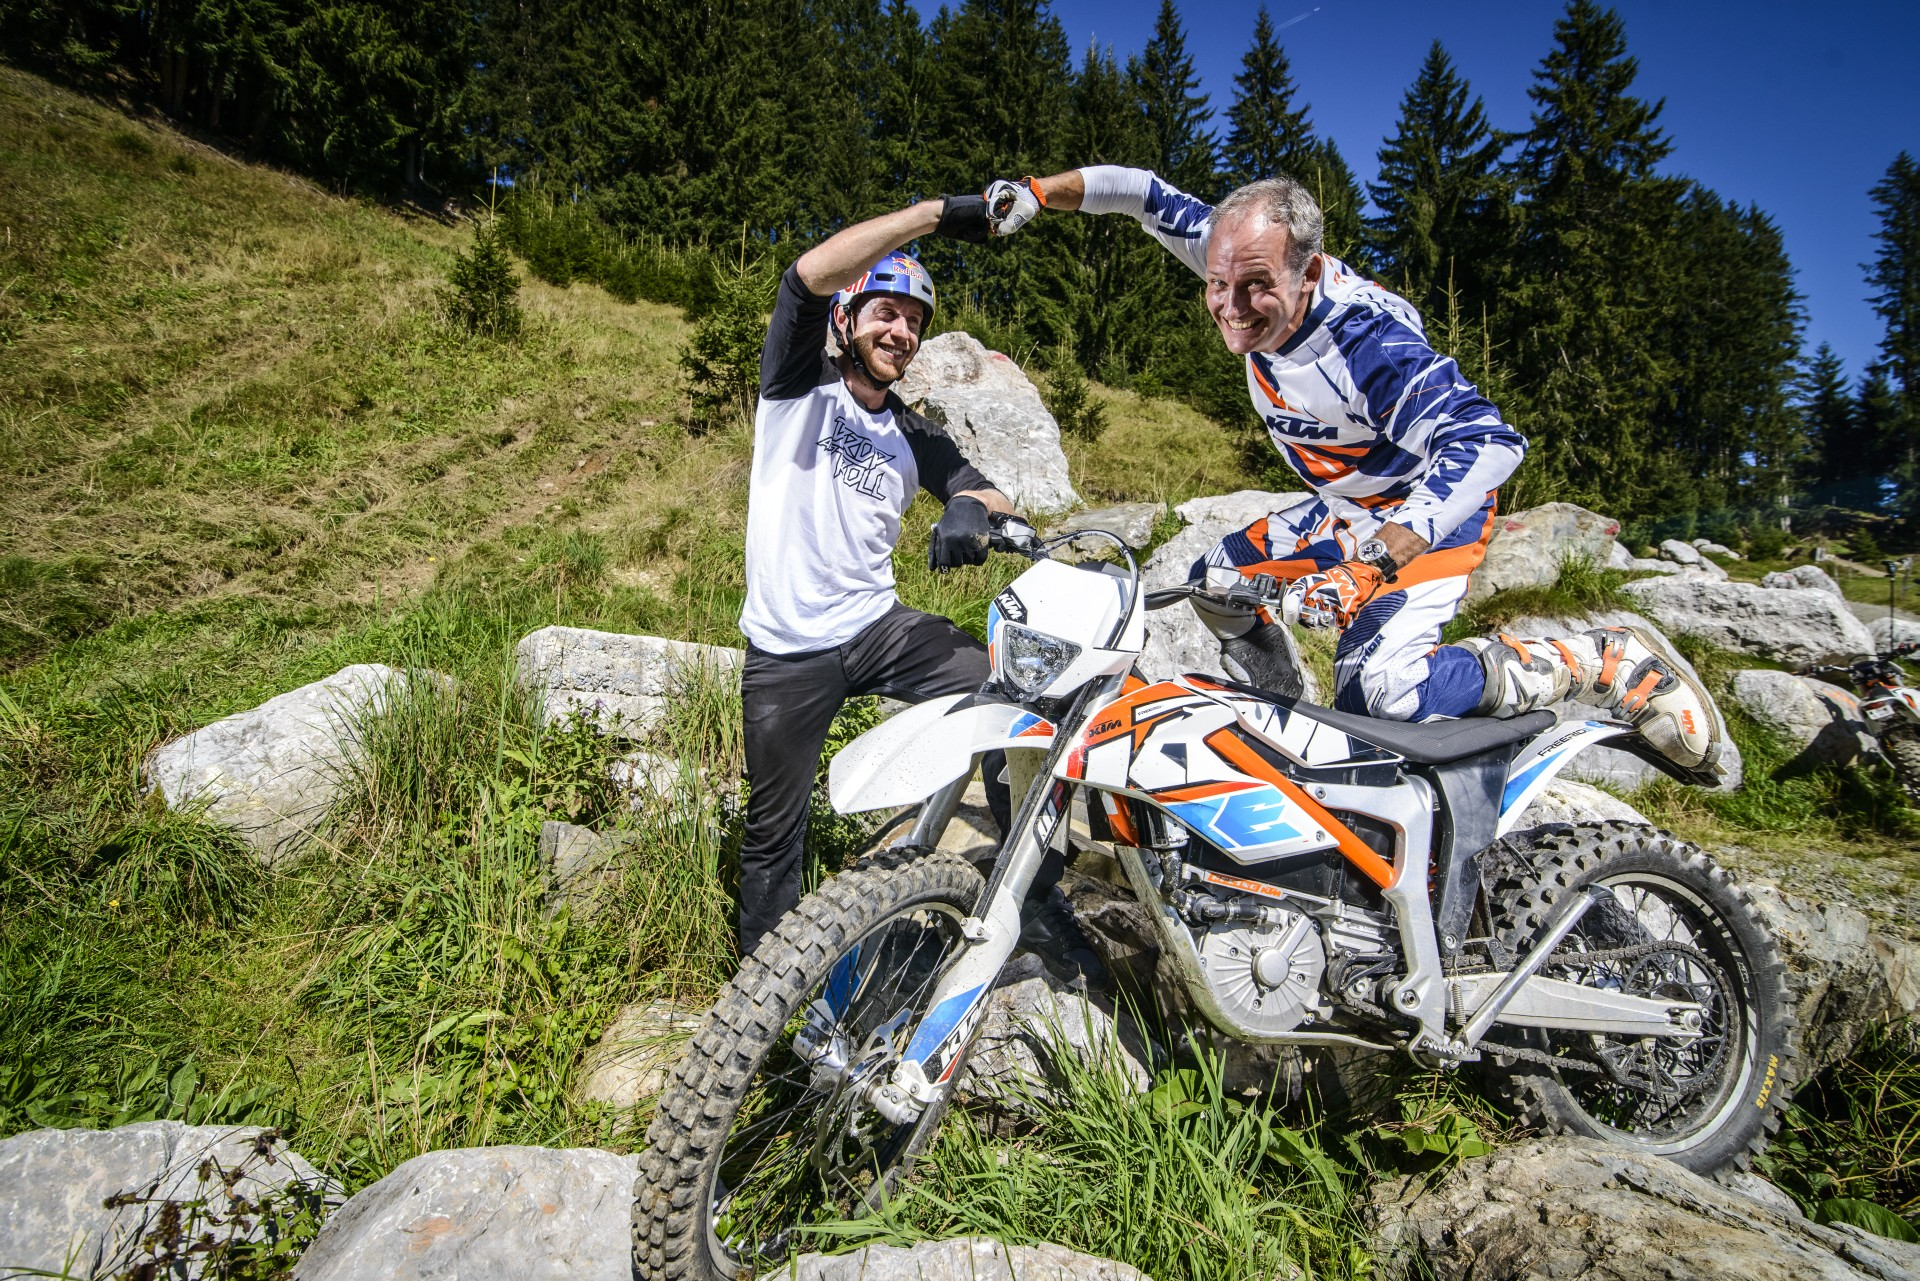 Three reasons to love the KTM FREERIDE E